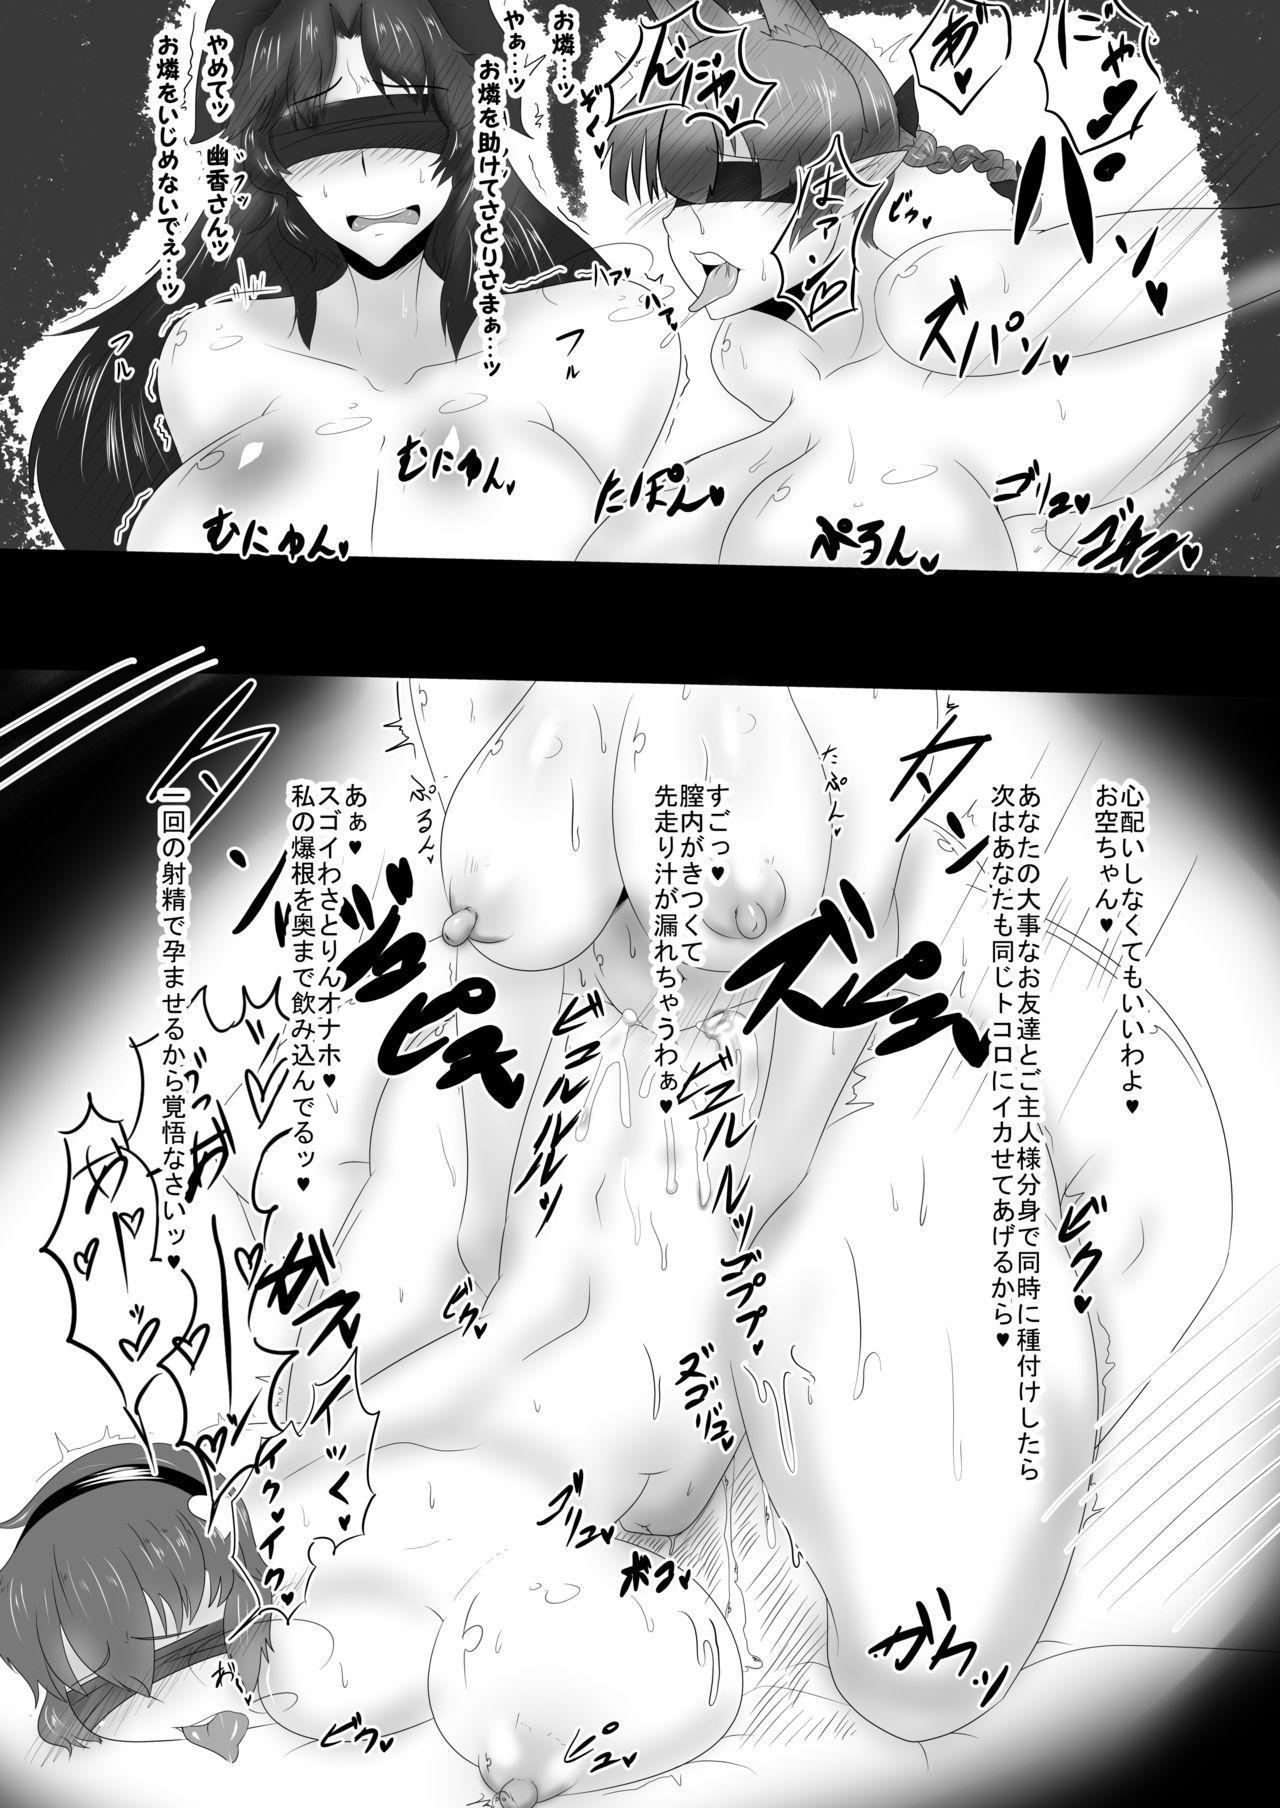 [Black_Sugar(Kari) (Kuroi Megane)] Touhou Futabusa ~Kazami Yuuka~ 2 (Touhou Project) [Digital] 6